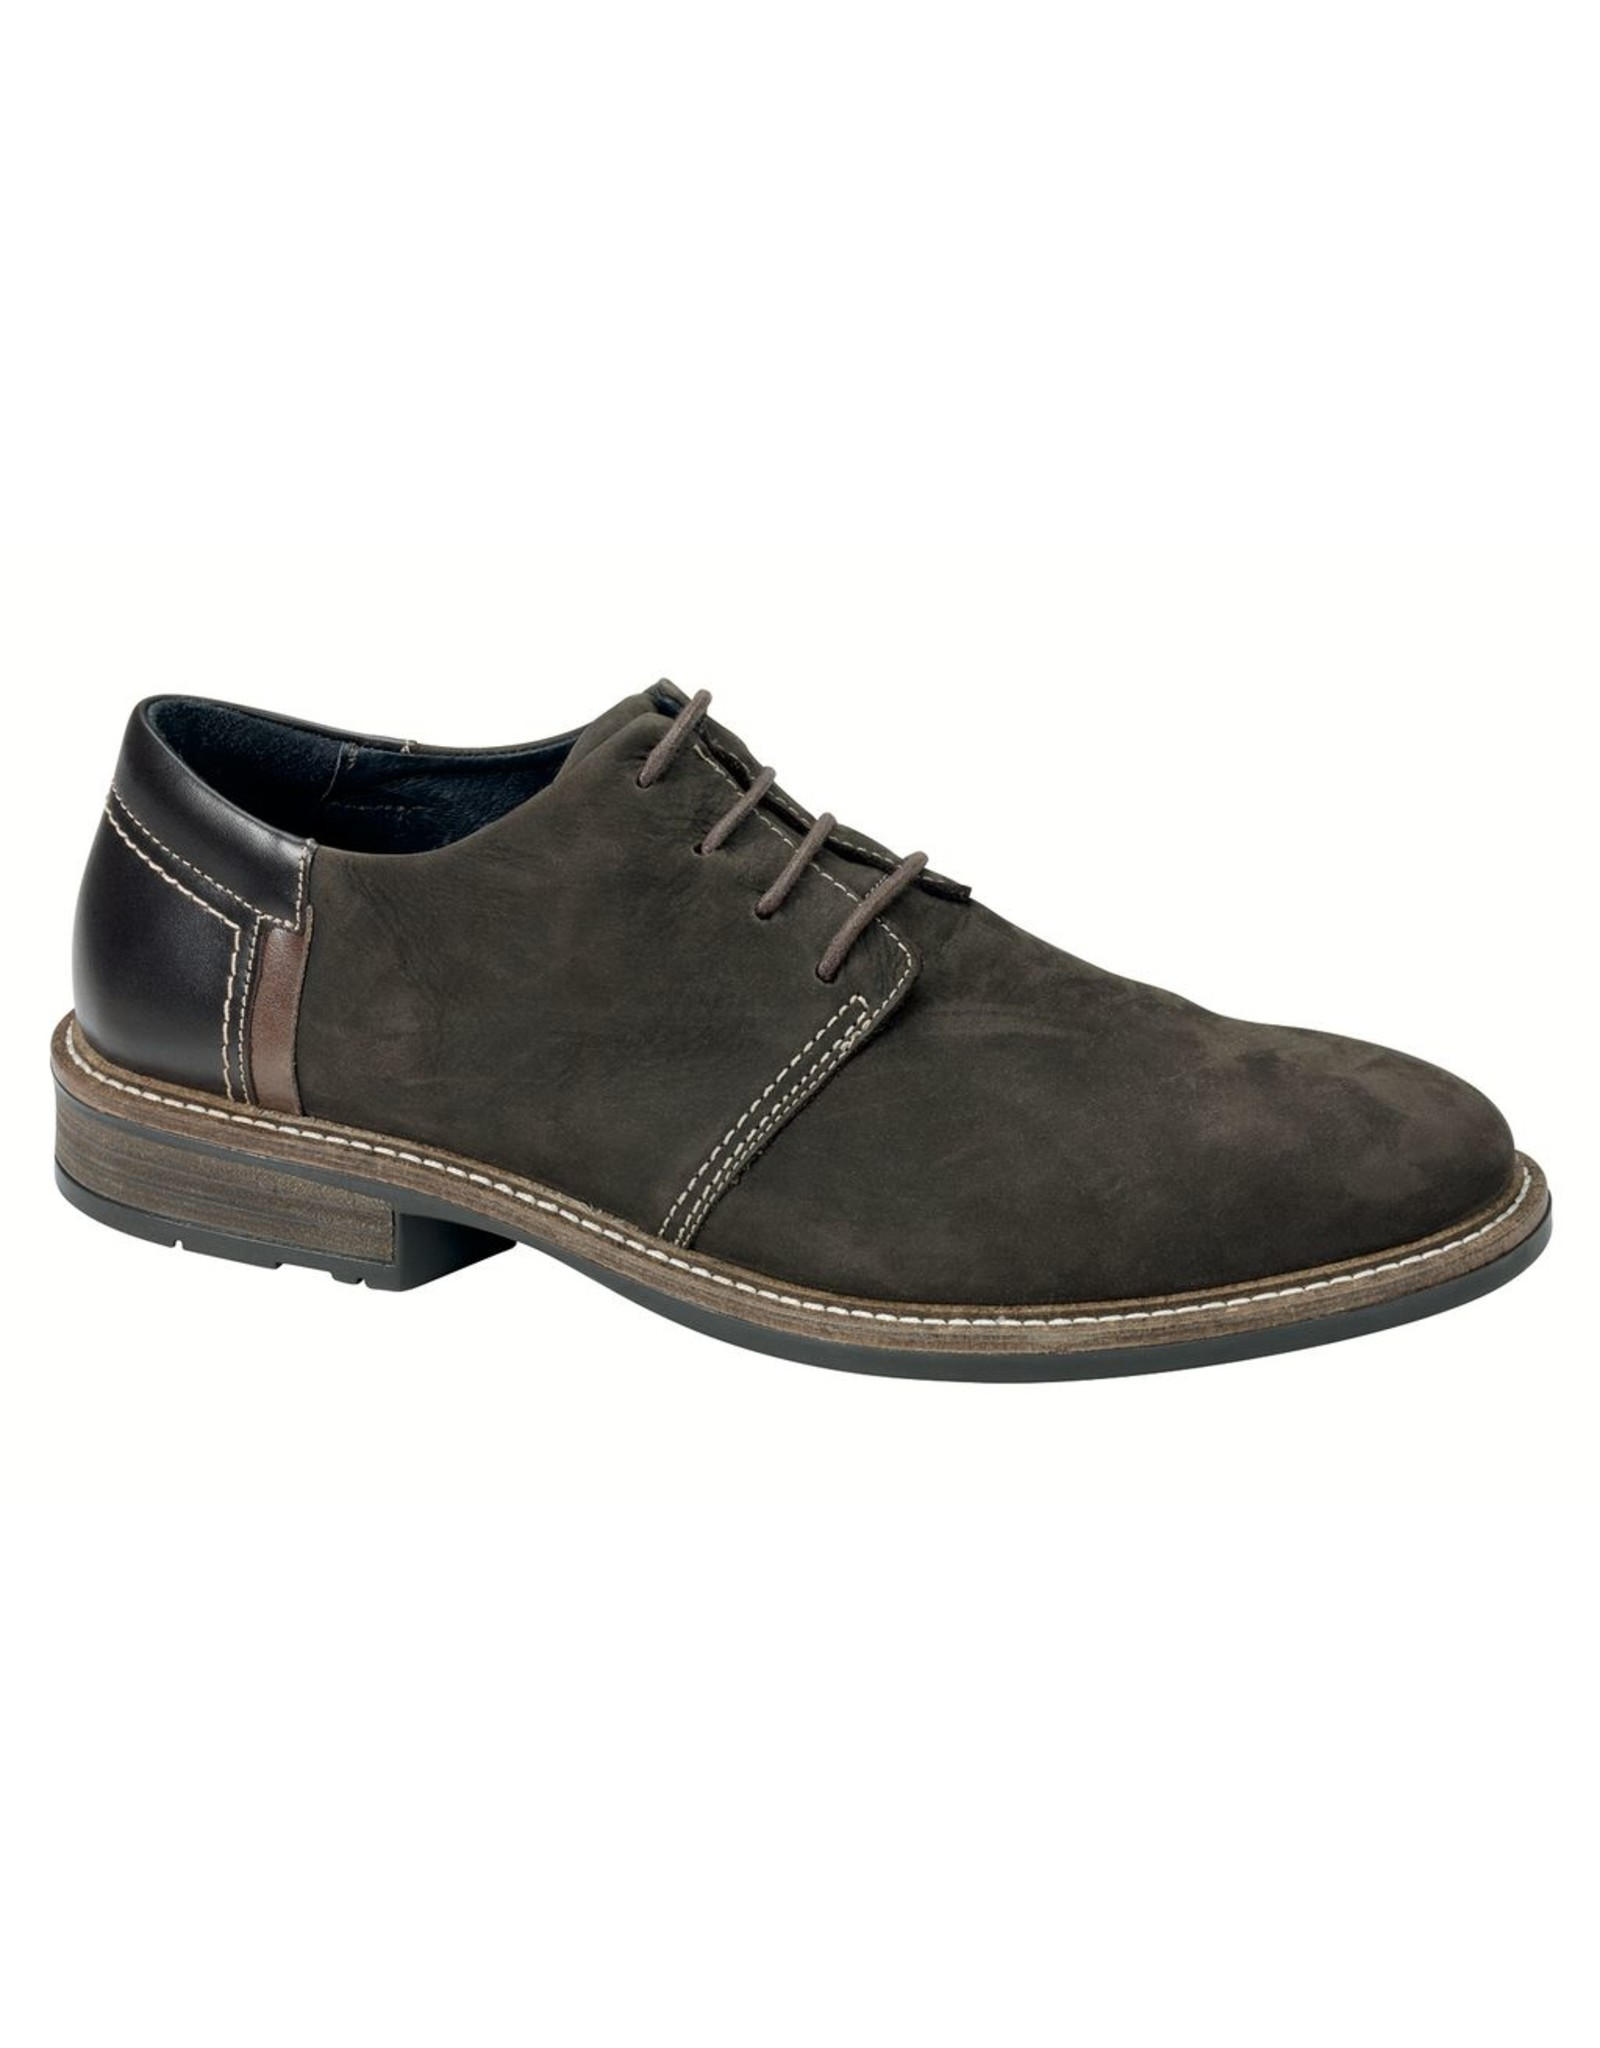 Chief Men's Shoe